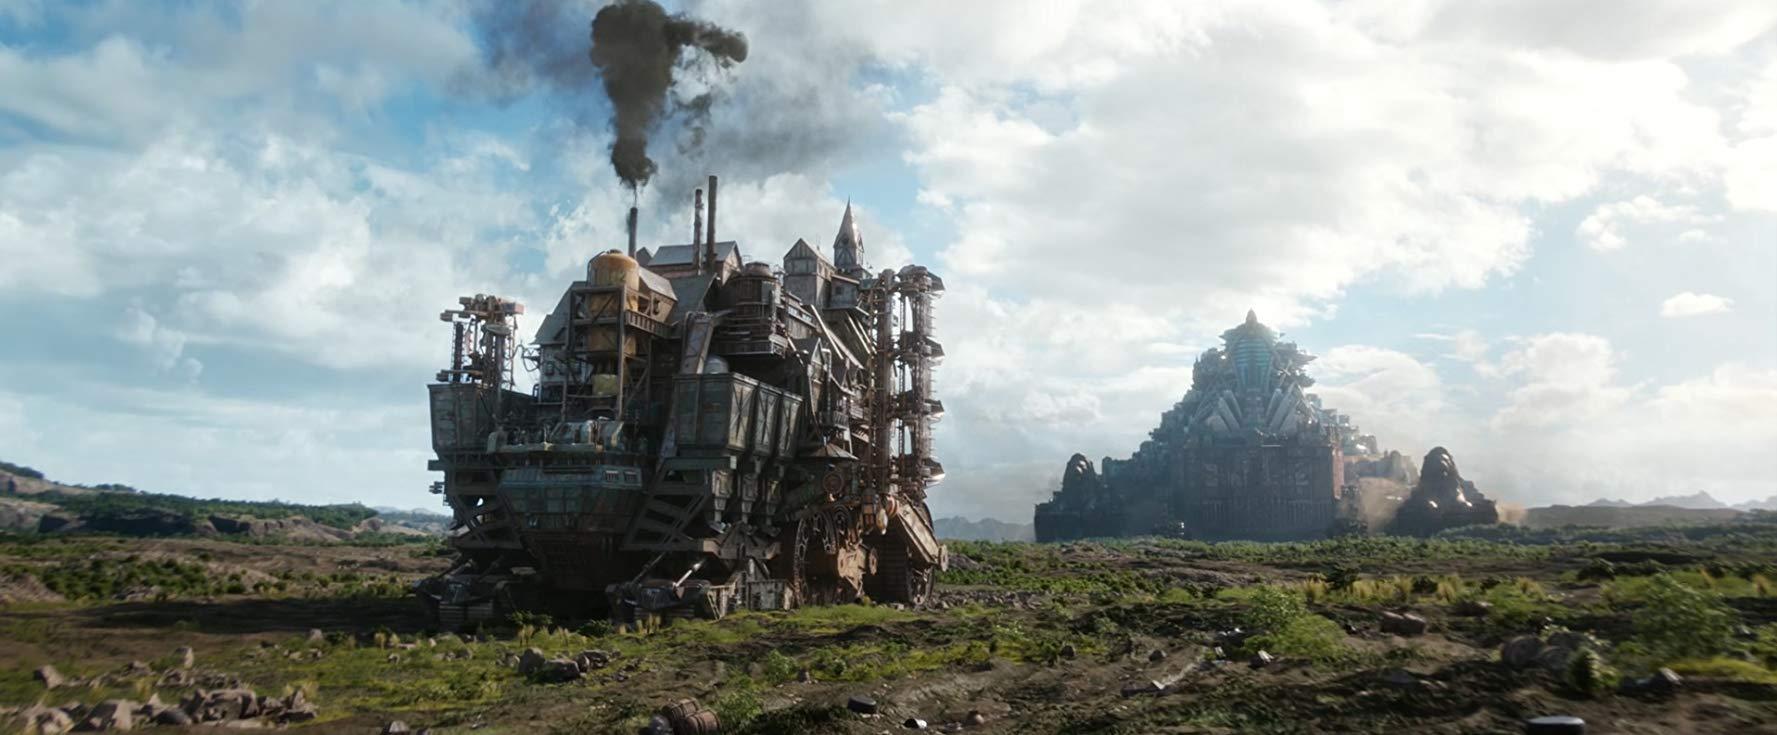 Terran civilization